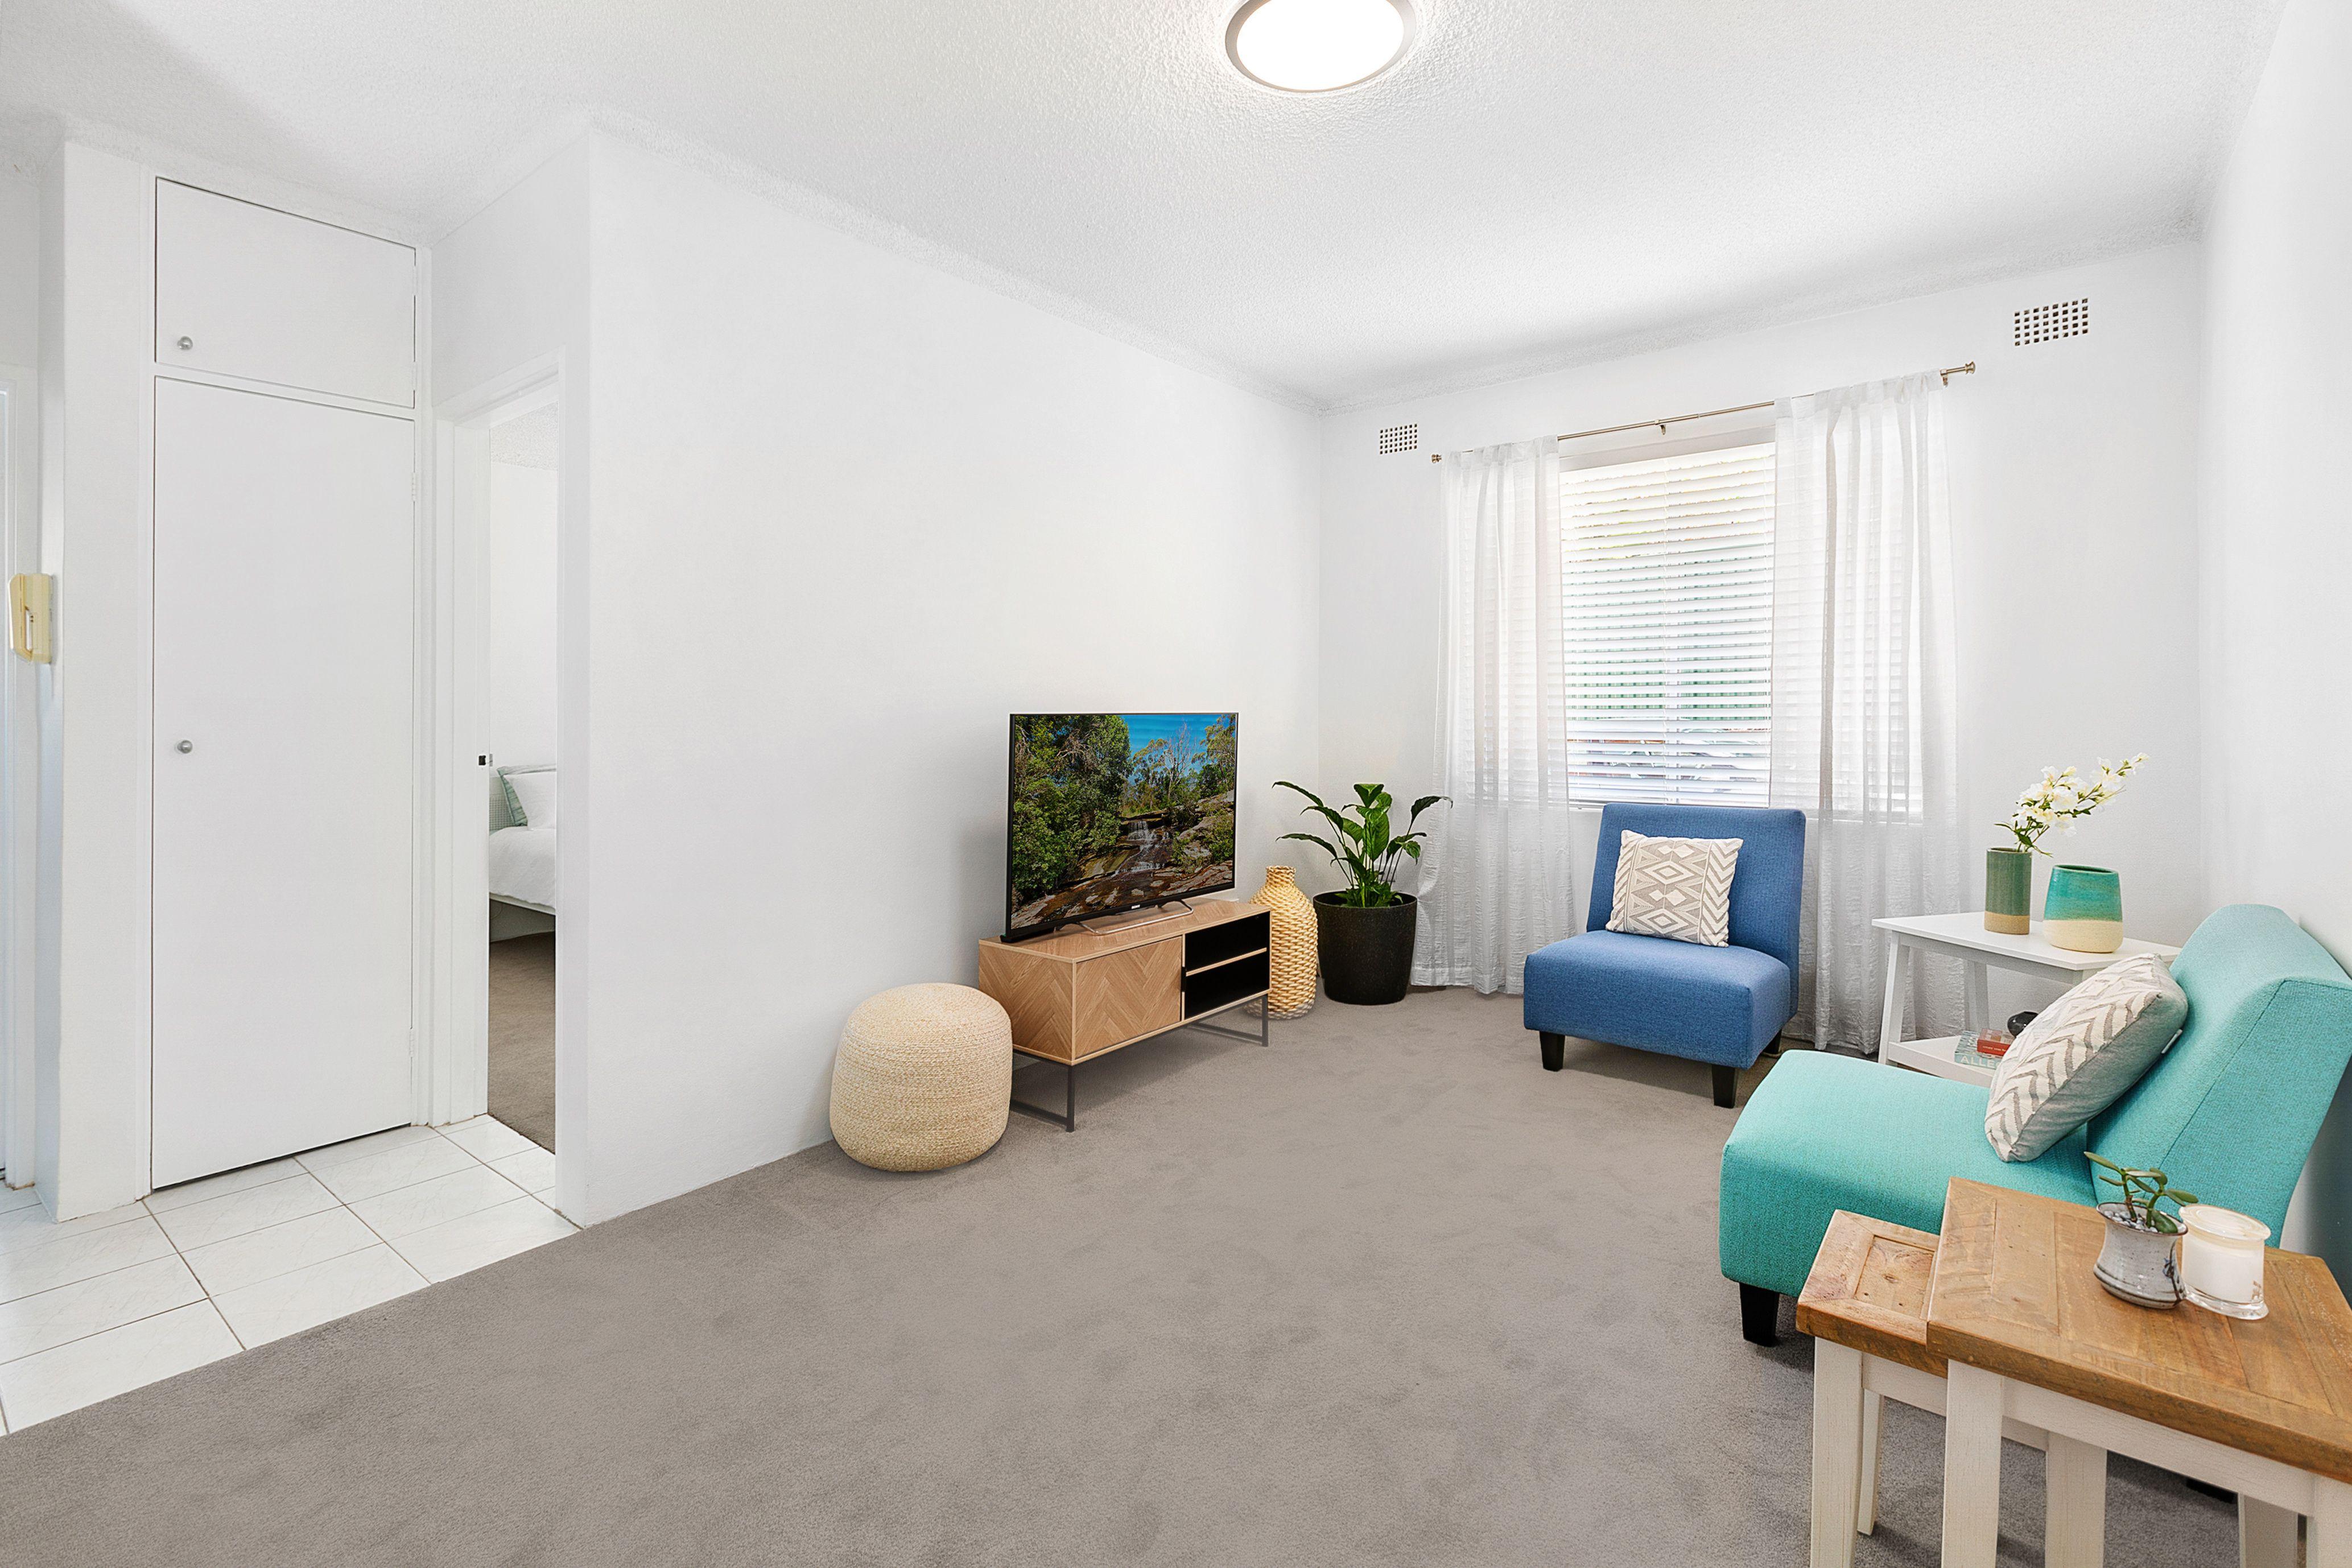 2/11 Bayley Street, Marrickville NSW 2204